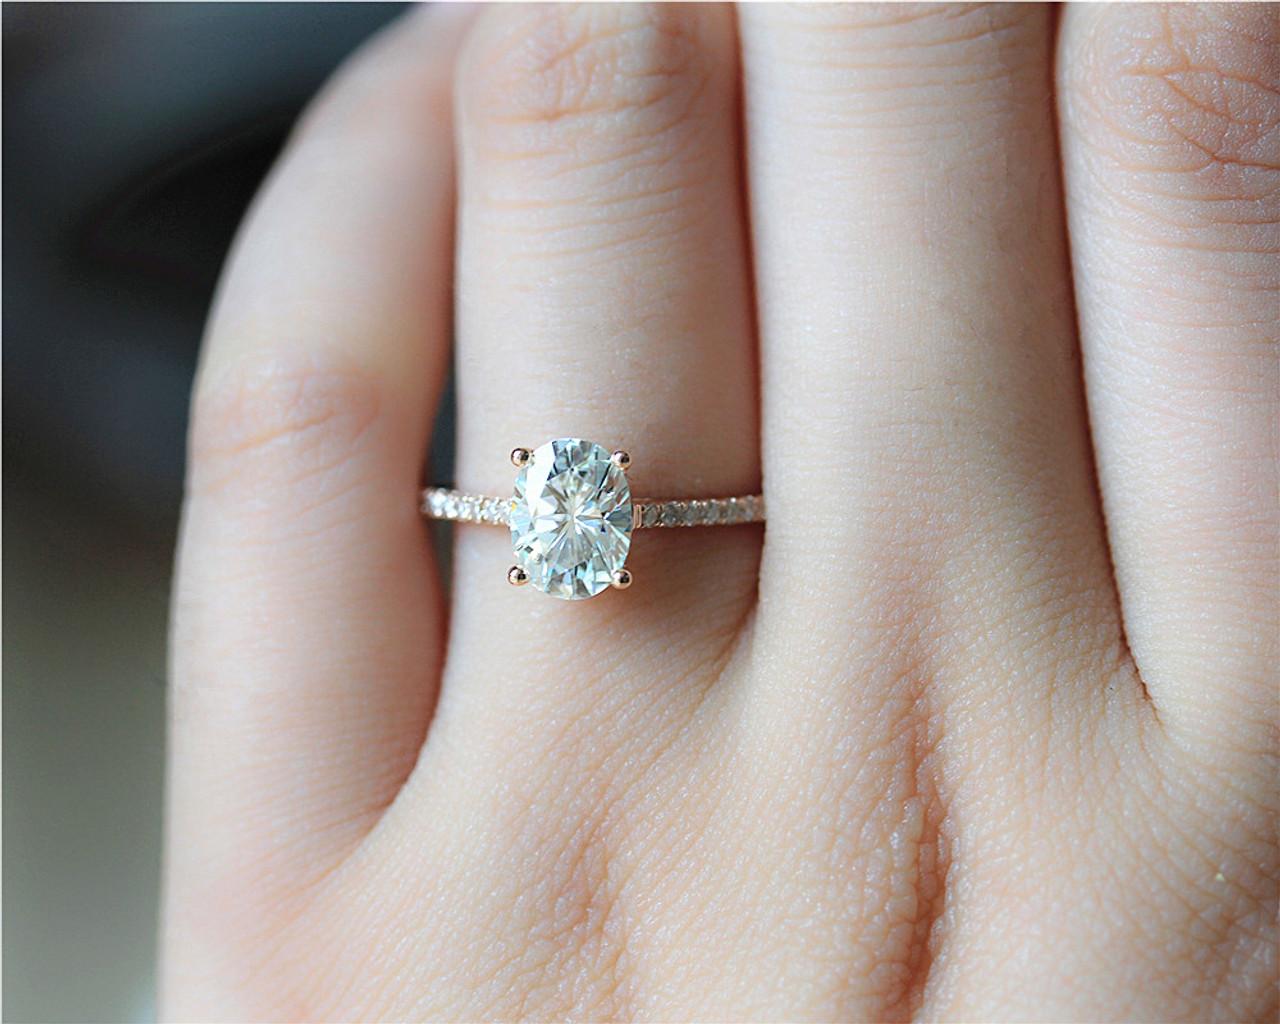 1 5ct Oval Brilliant Moissanite Engagement Ring Solid 14k Rose Gold Moissanite Ring